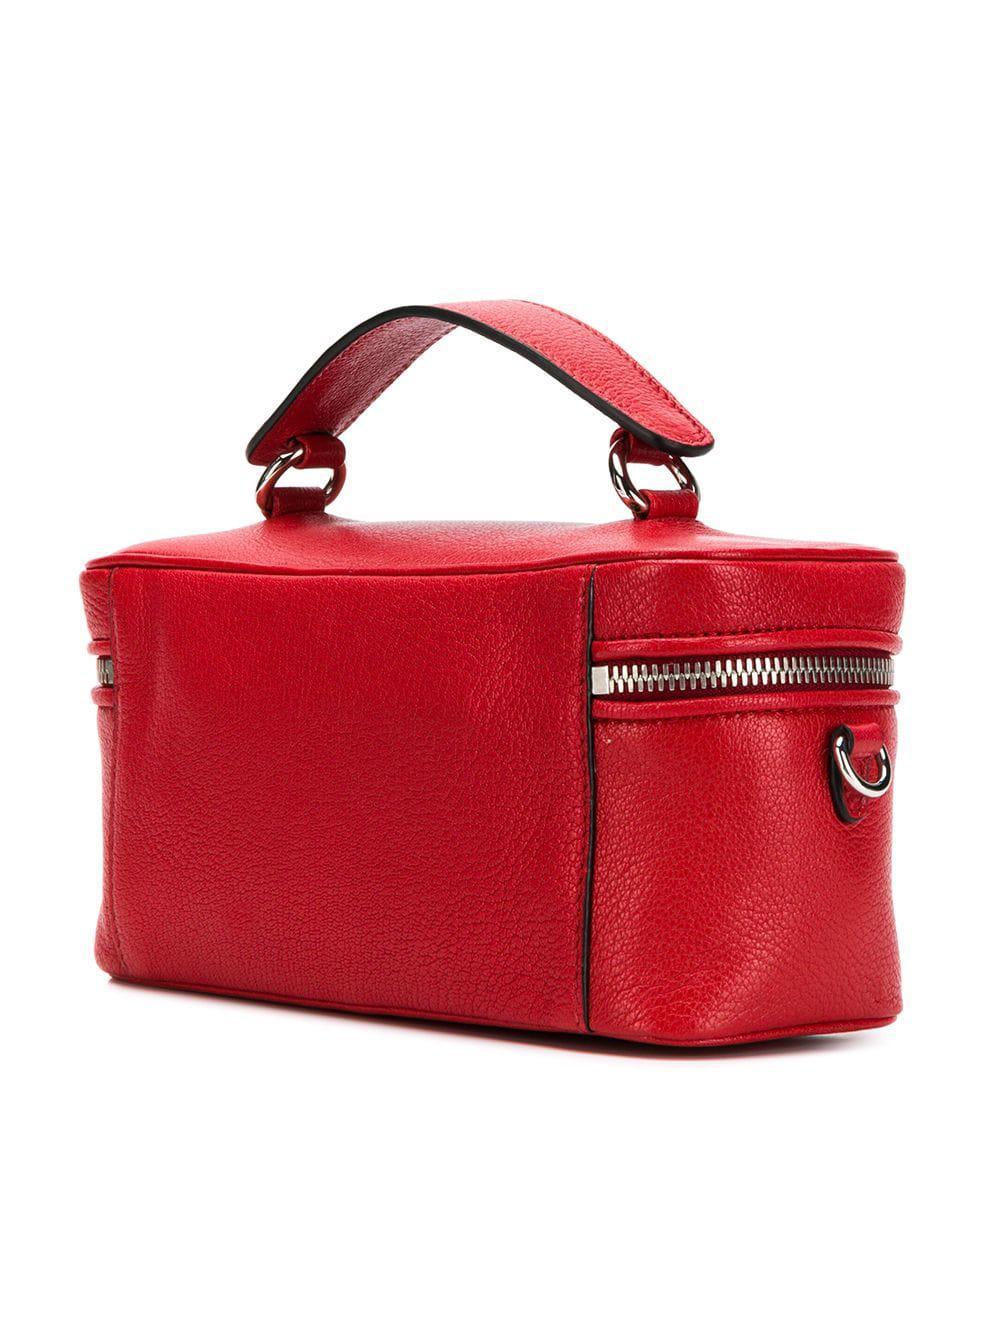 Lyst - Miu Miu Madras Bucket Bag in Red a2bd8fbbd8143